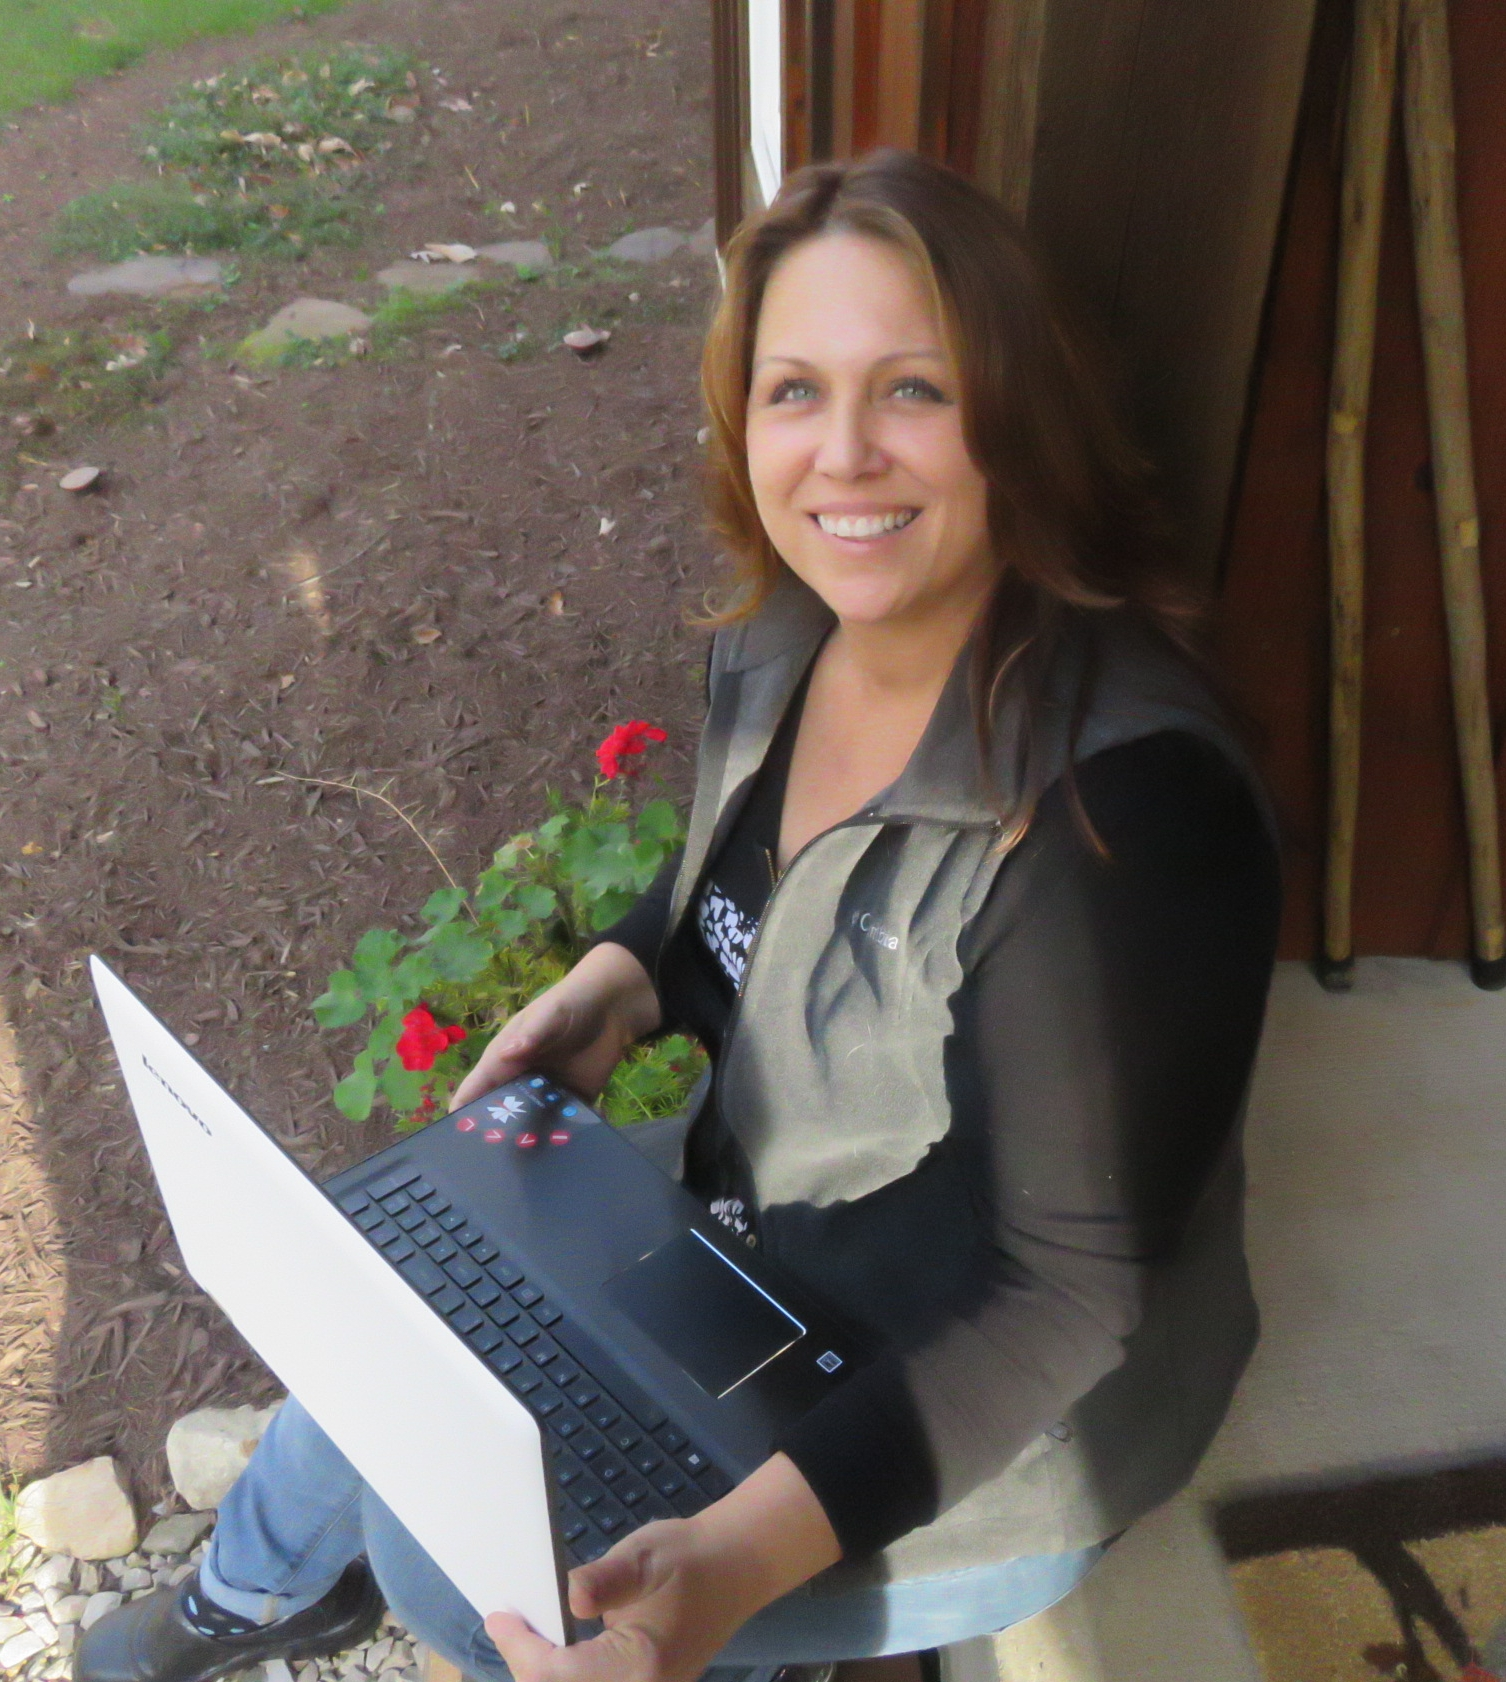 Kathy Volpi